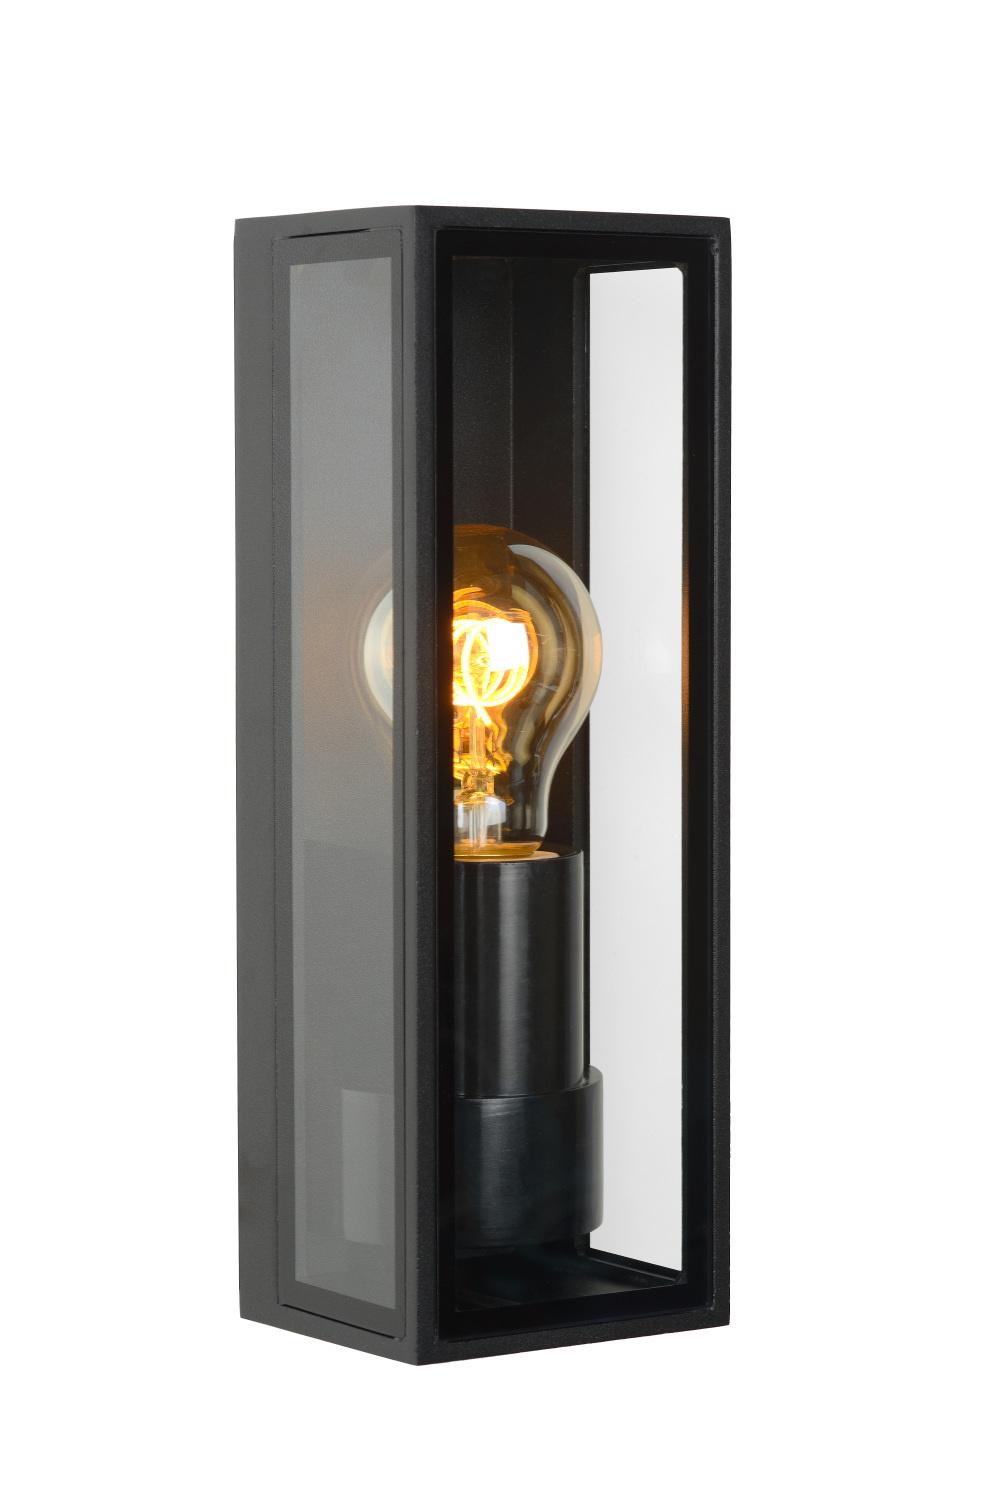 Lucide DUKAN Wandlamp Buiten-Zwart-1xE27-15W-IP65-Glas